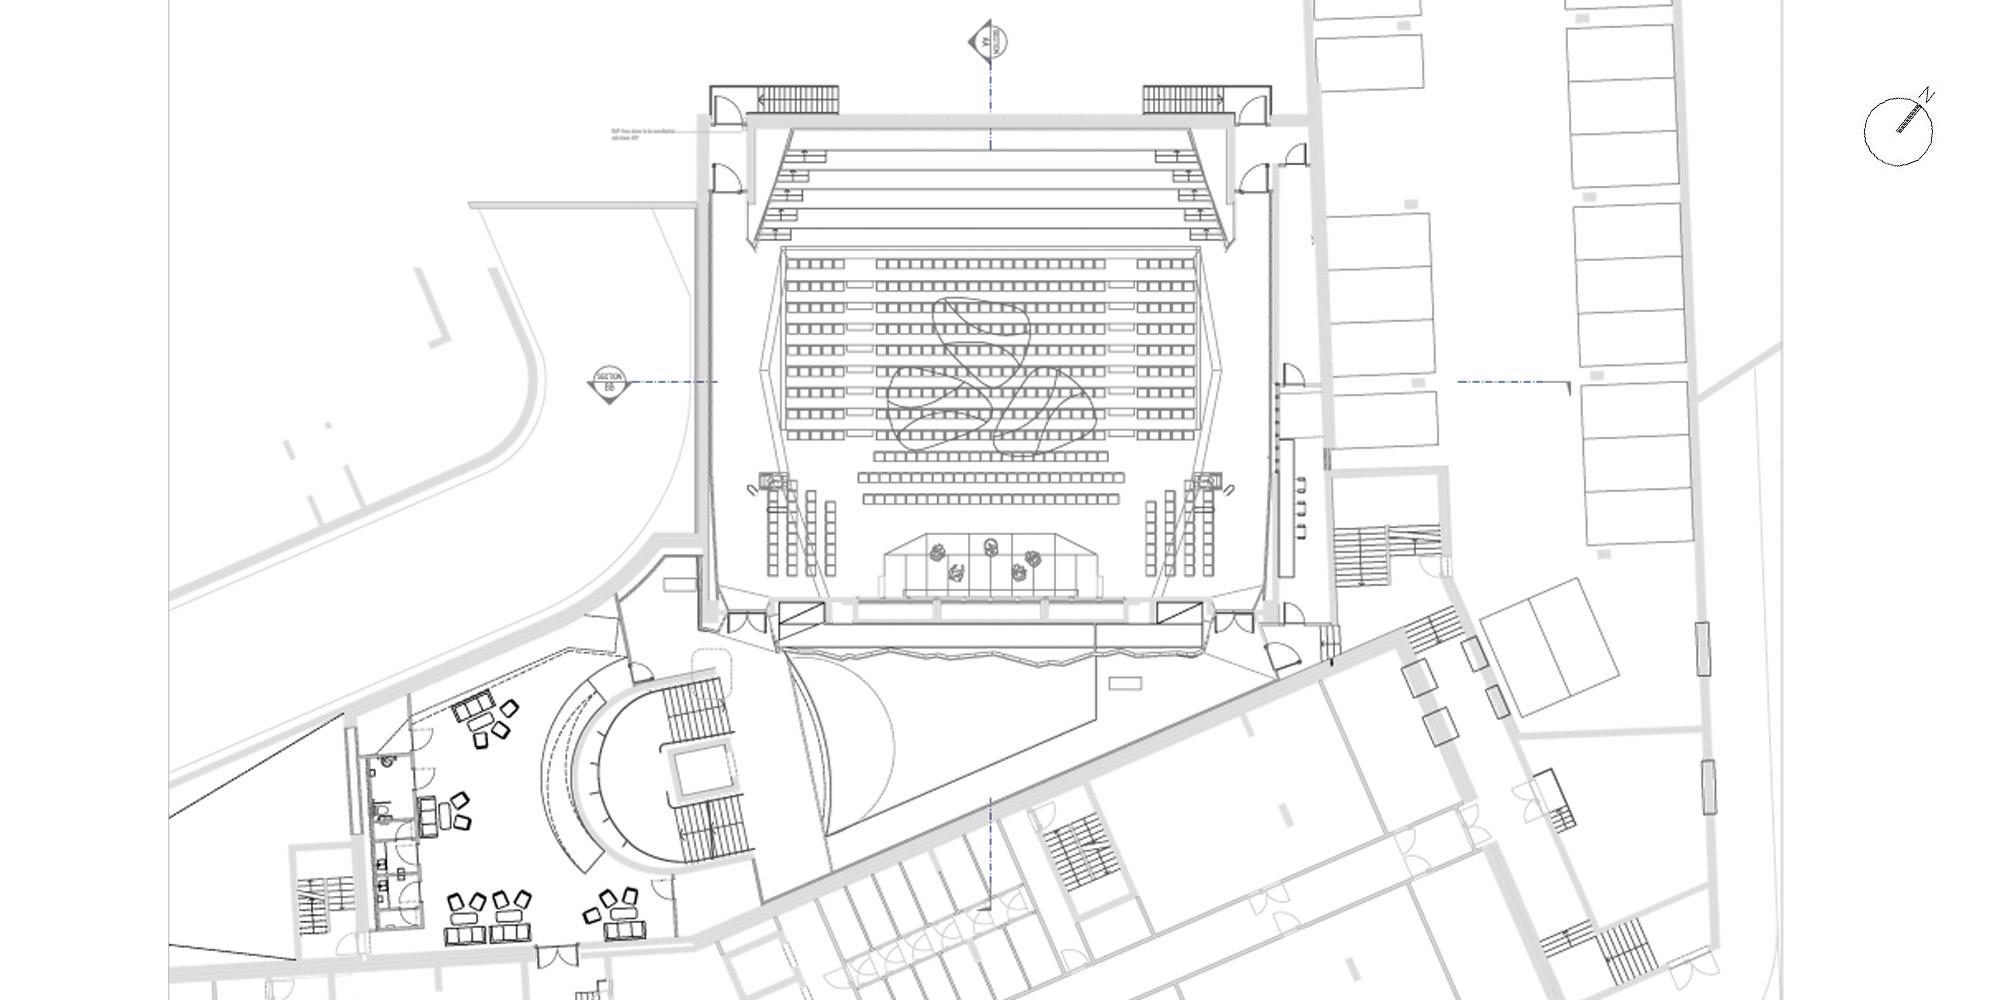 Basement floor plan © Studio Seilern Architects